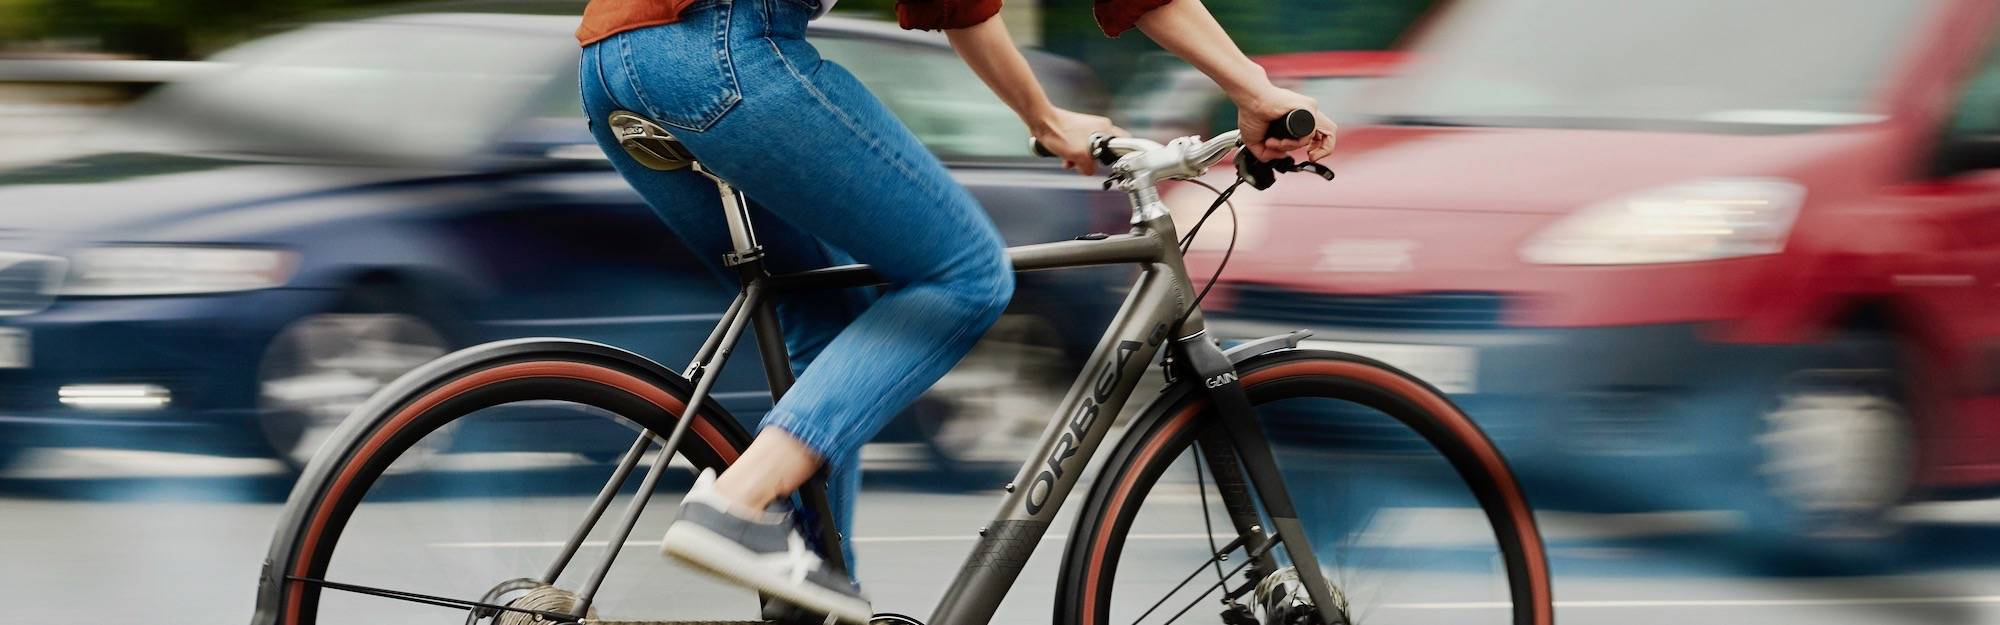 Cruising the streets on Orbea bikes.